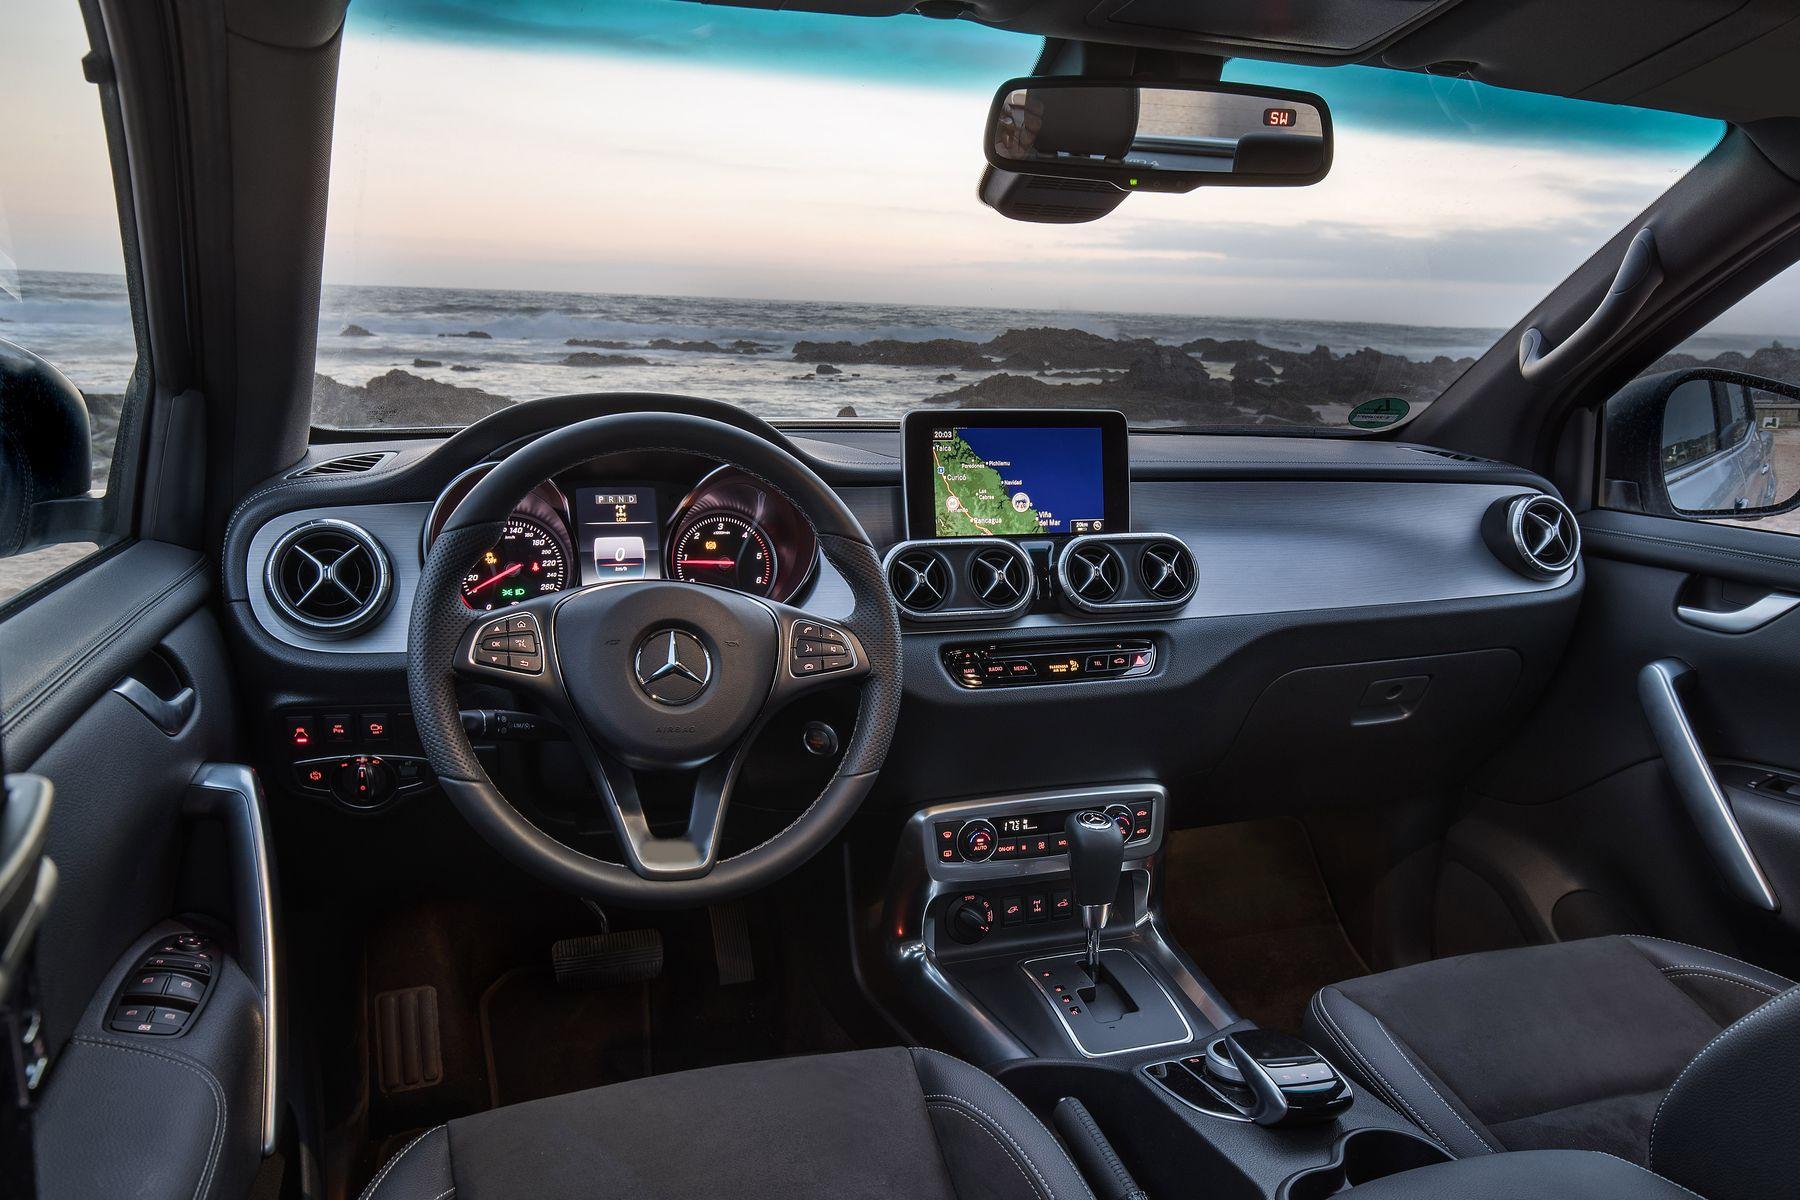 Mercedes Benz Camper Van For Sale Uk